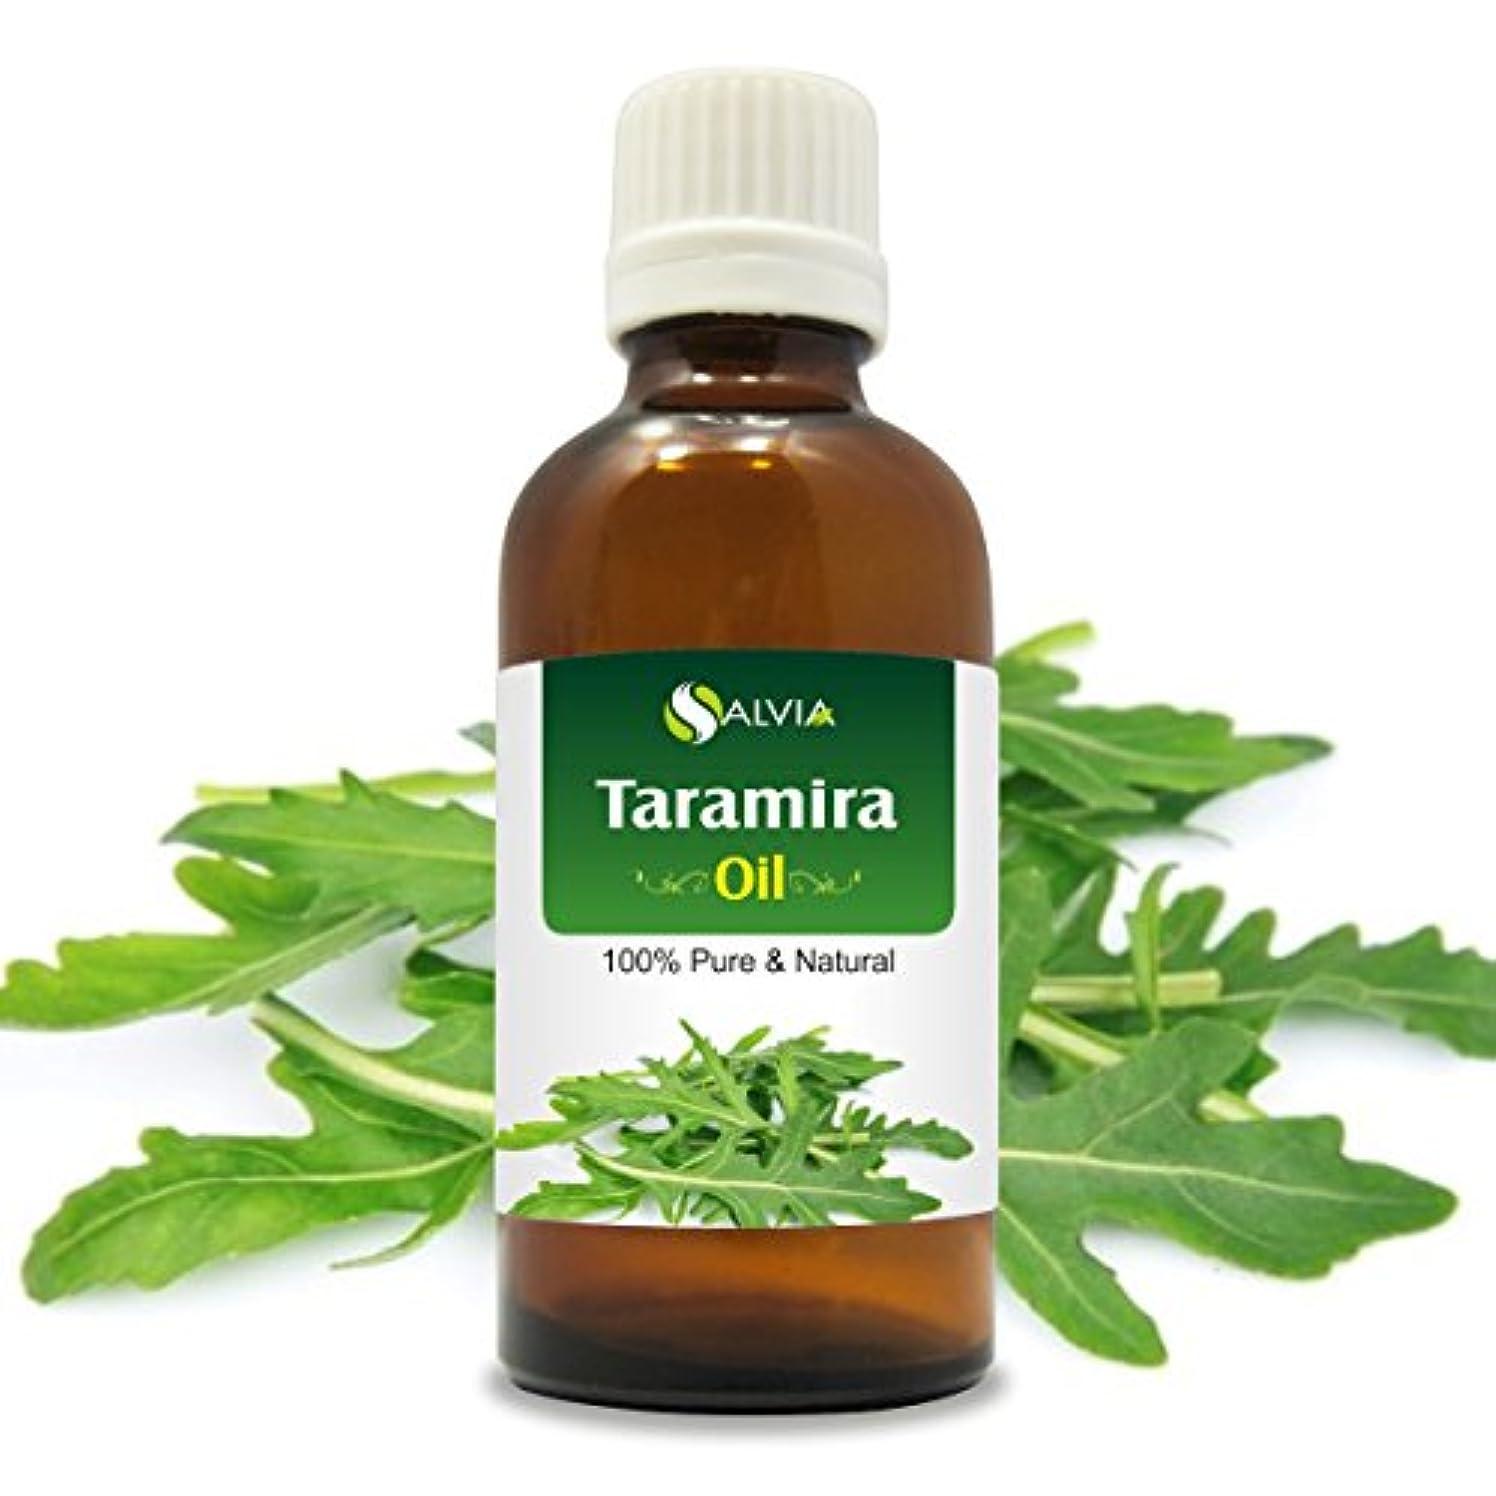 TARAMIRA OIL 100% NATURAL PURE UNDILUTED UNCUT ESSENTIAL OIL 30ML